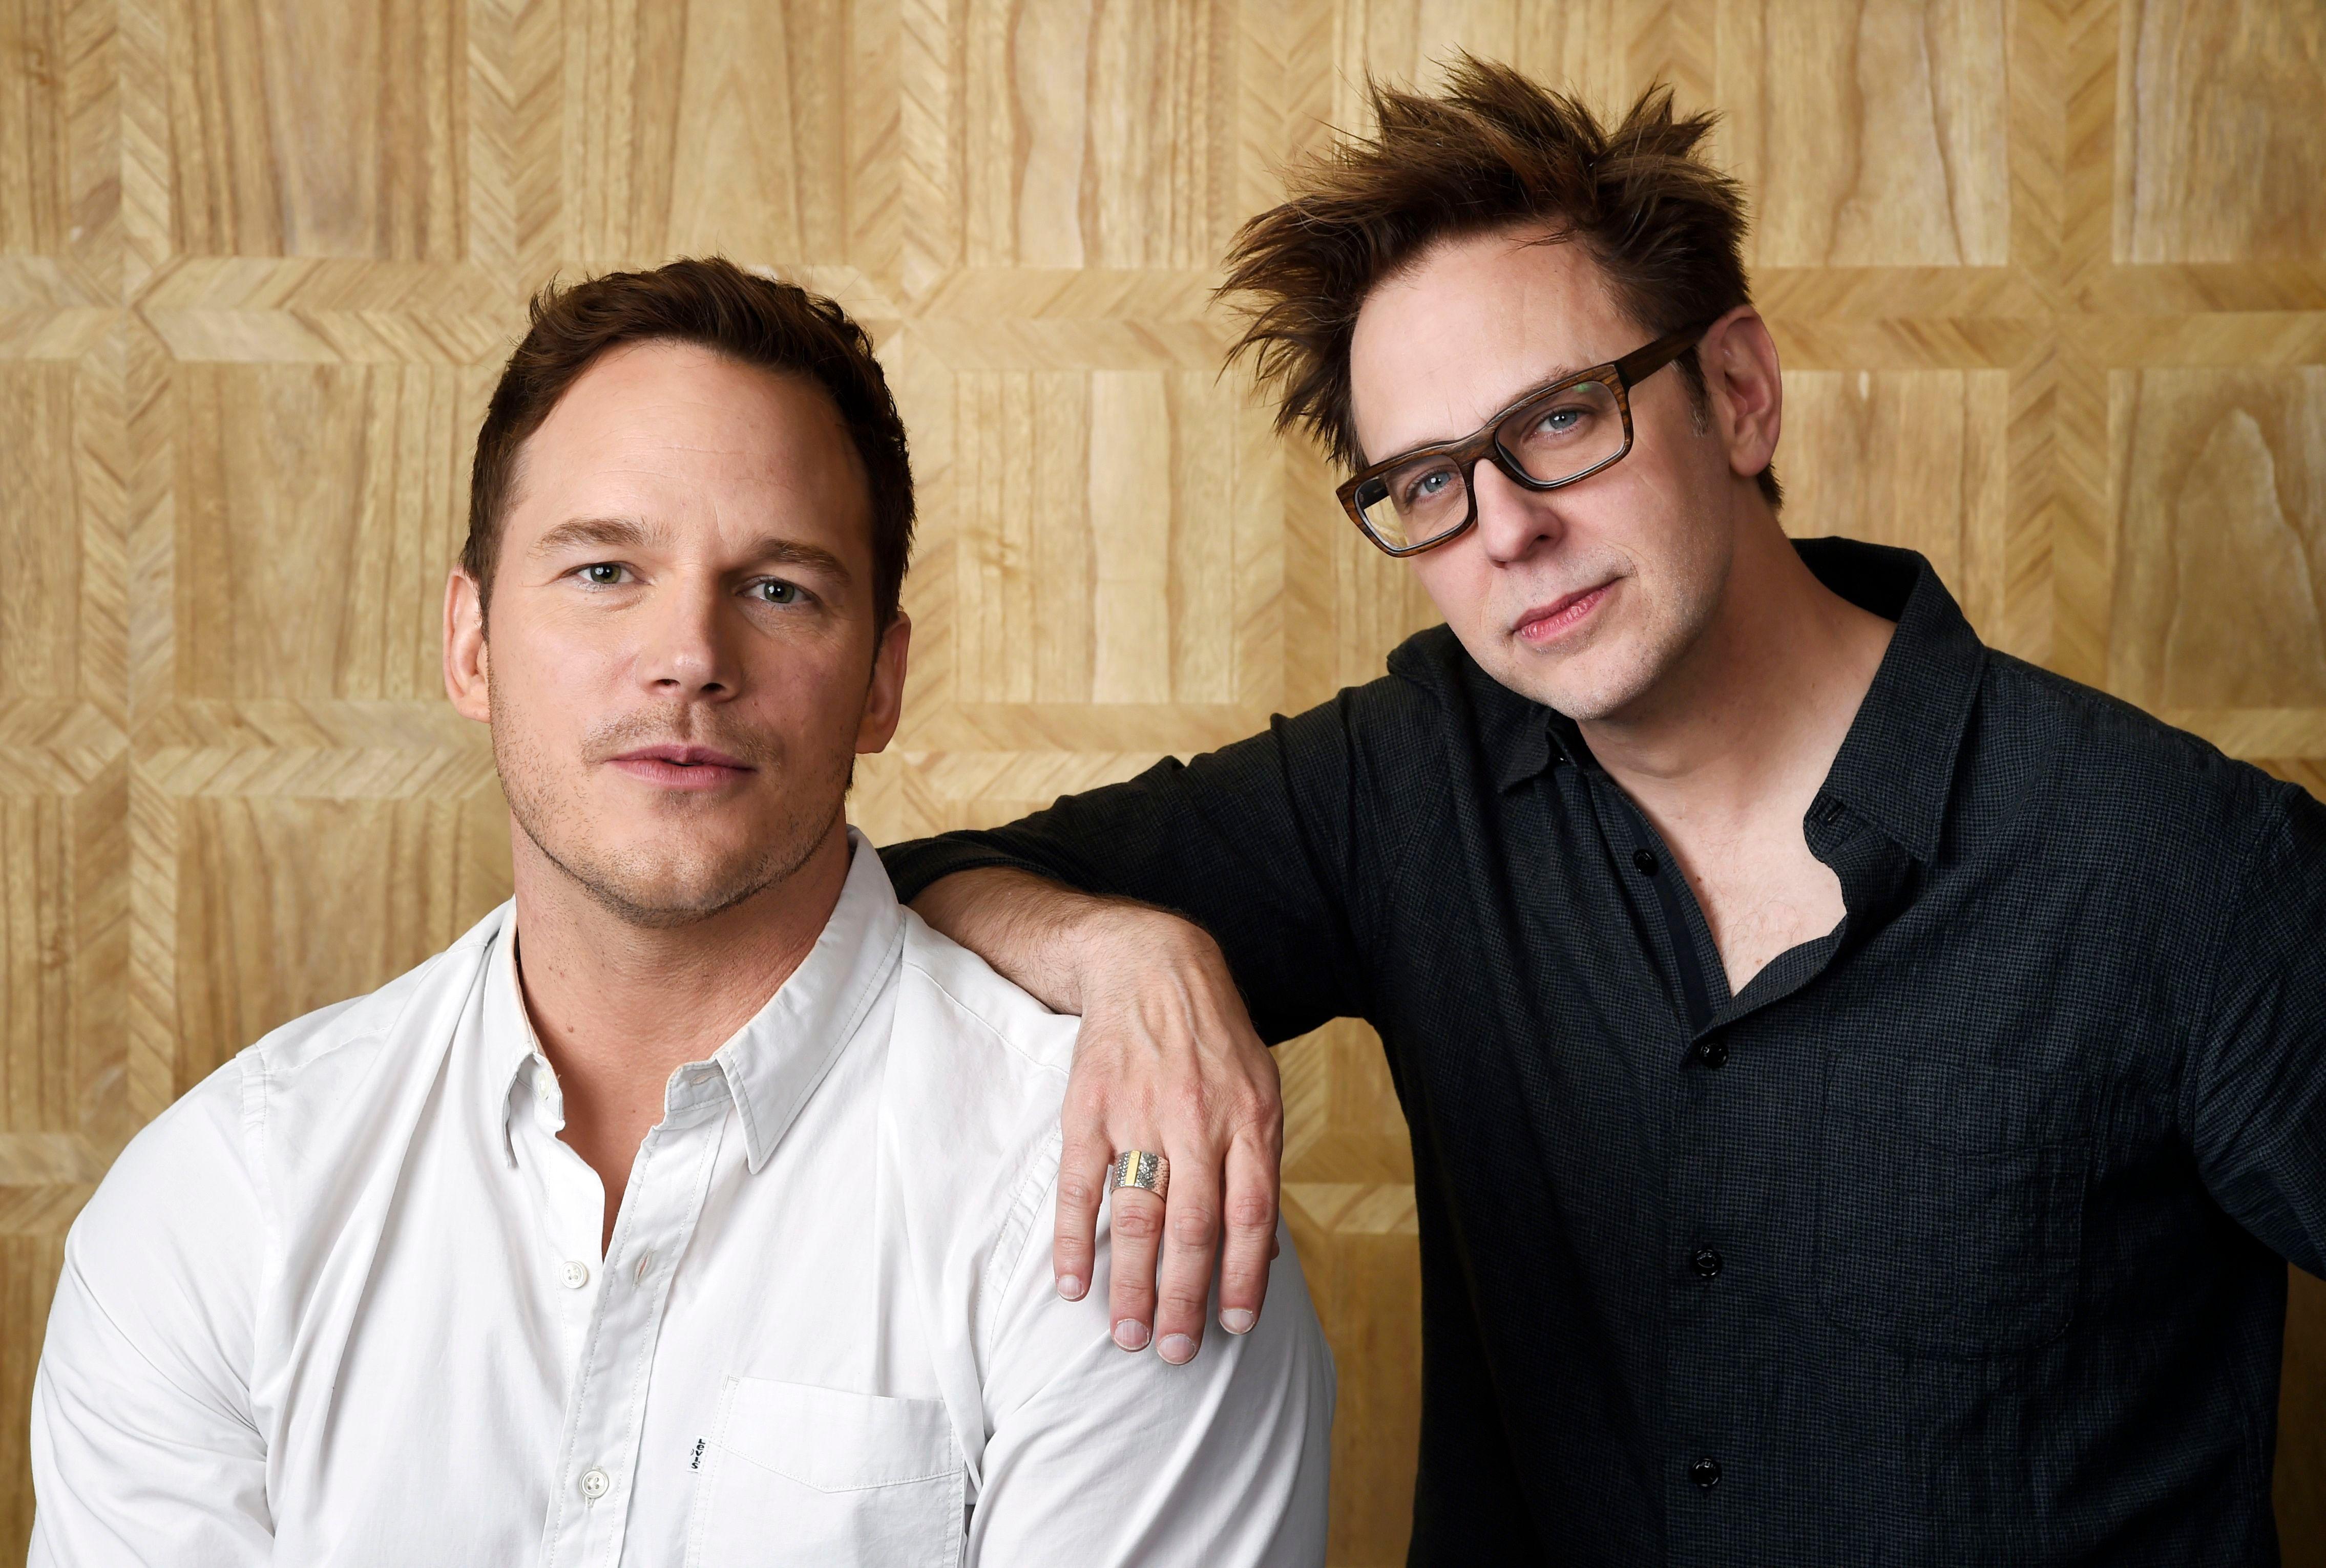 Chris Pratt Rejoices Over James Gunn's 'Guardians' Rehiring: 'I'm Really Proud of Disney'